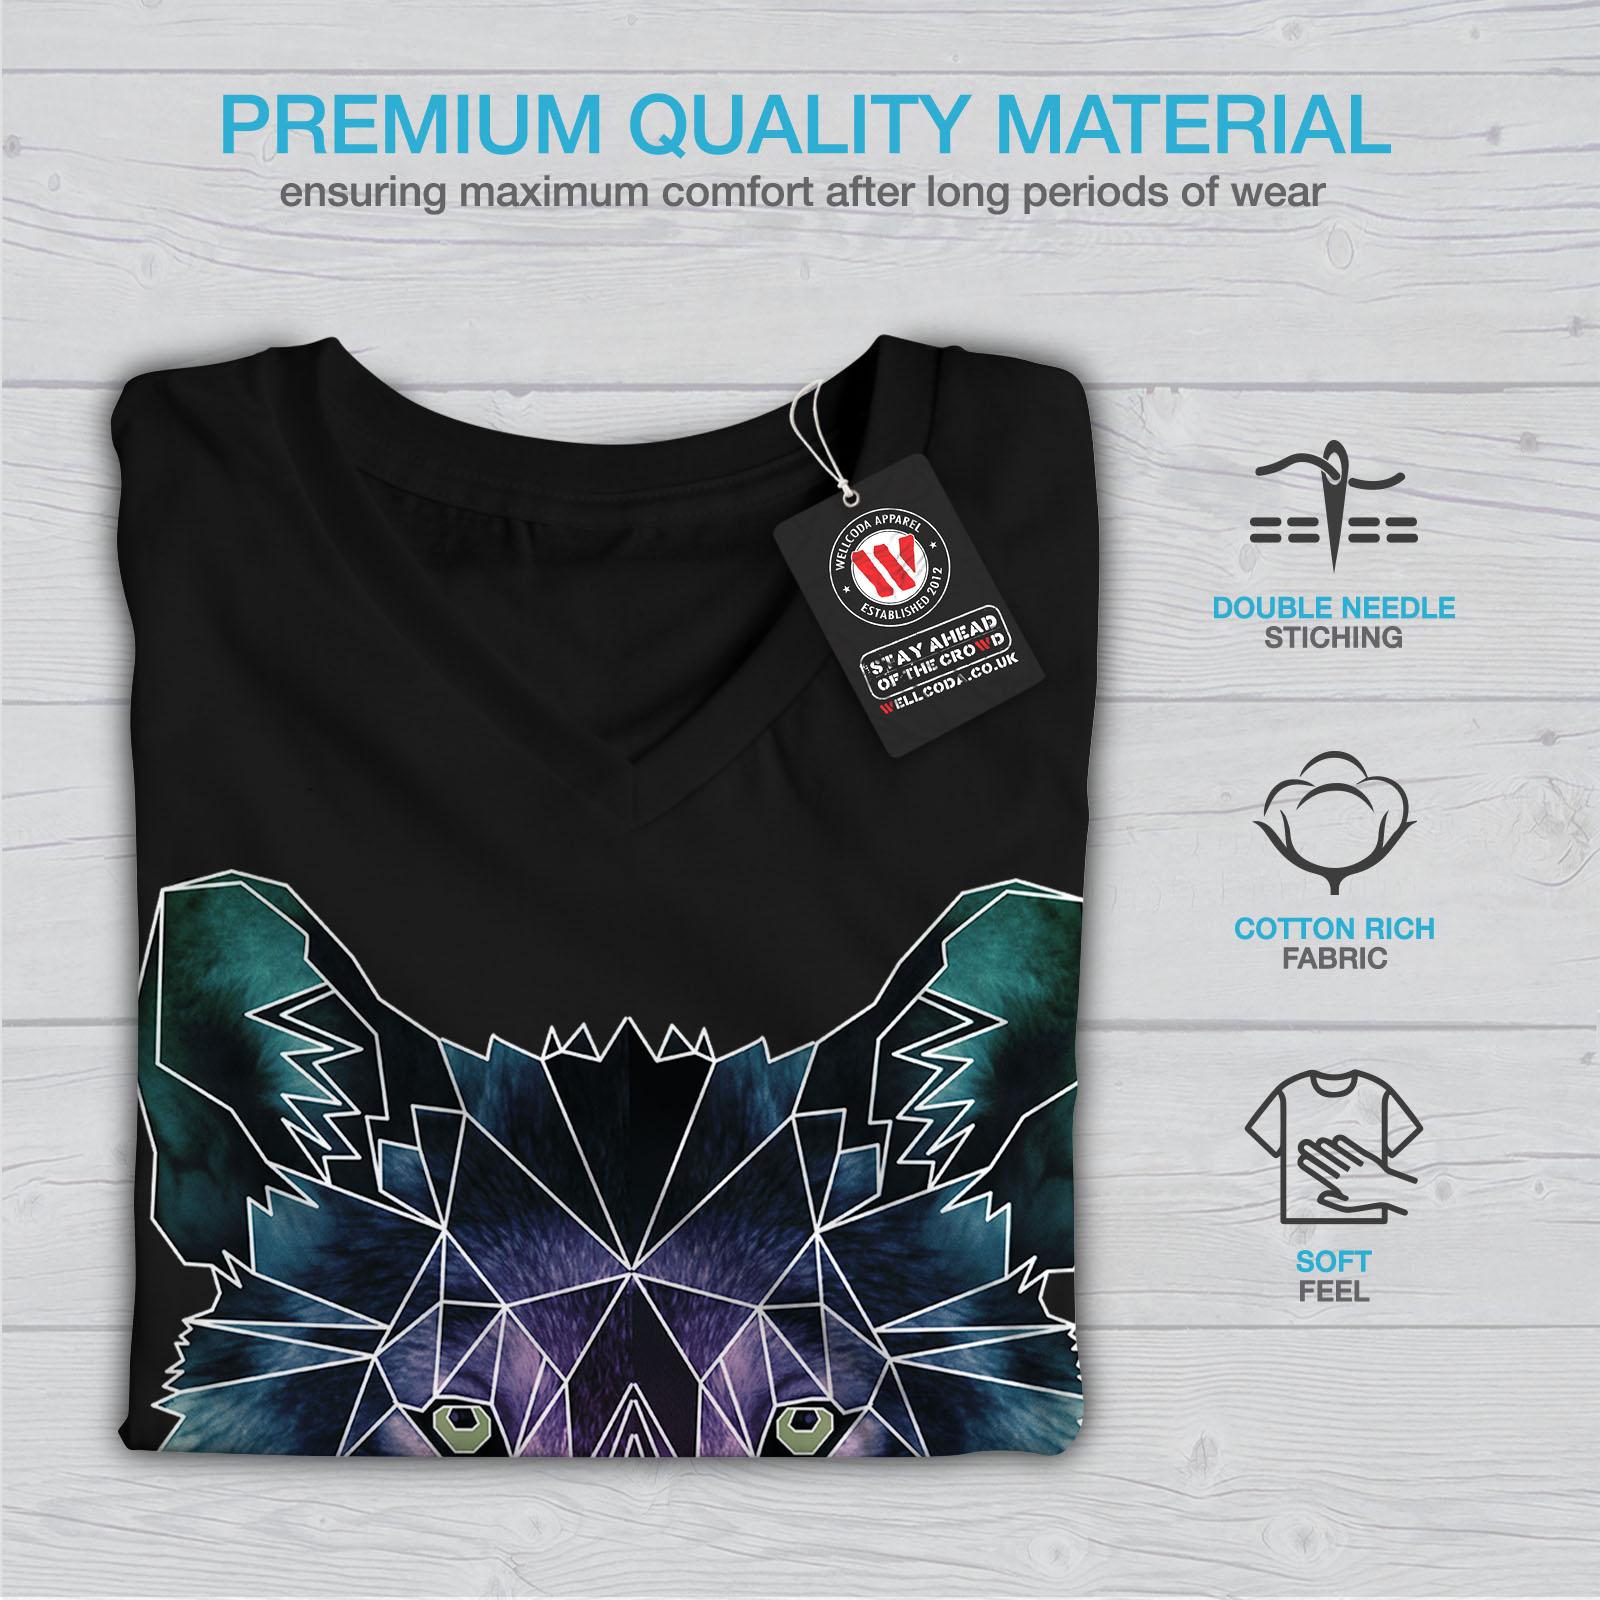 Wellcoda-Psychodelic-Wolf-Womens-V-Neck-T-shirt-Crystal-Graphic-Design-Tee thumbnail 5